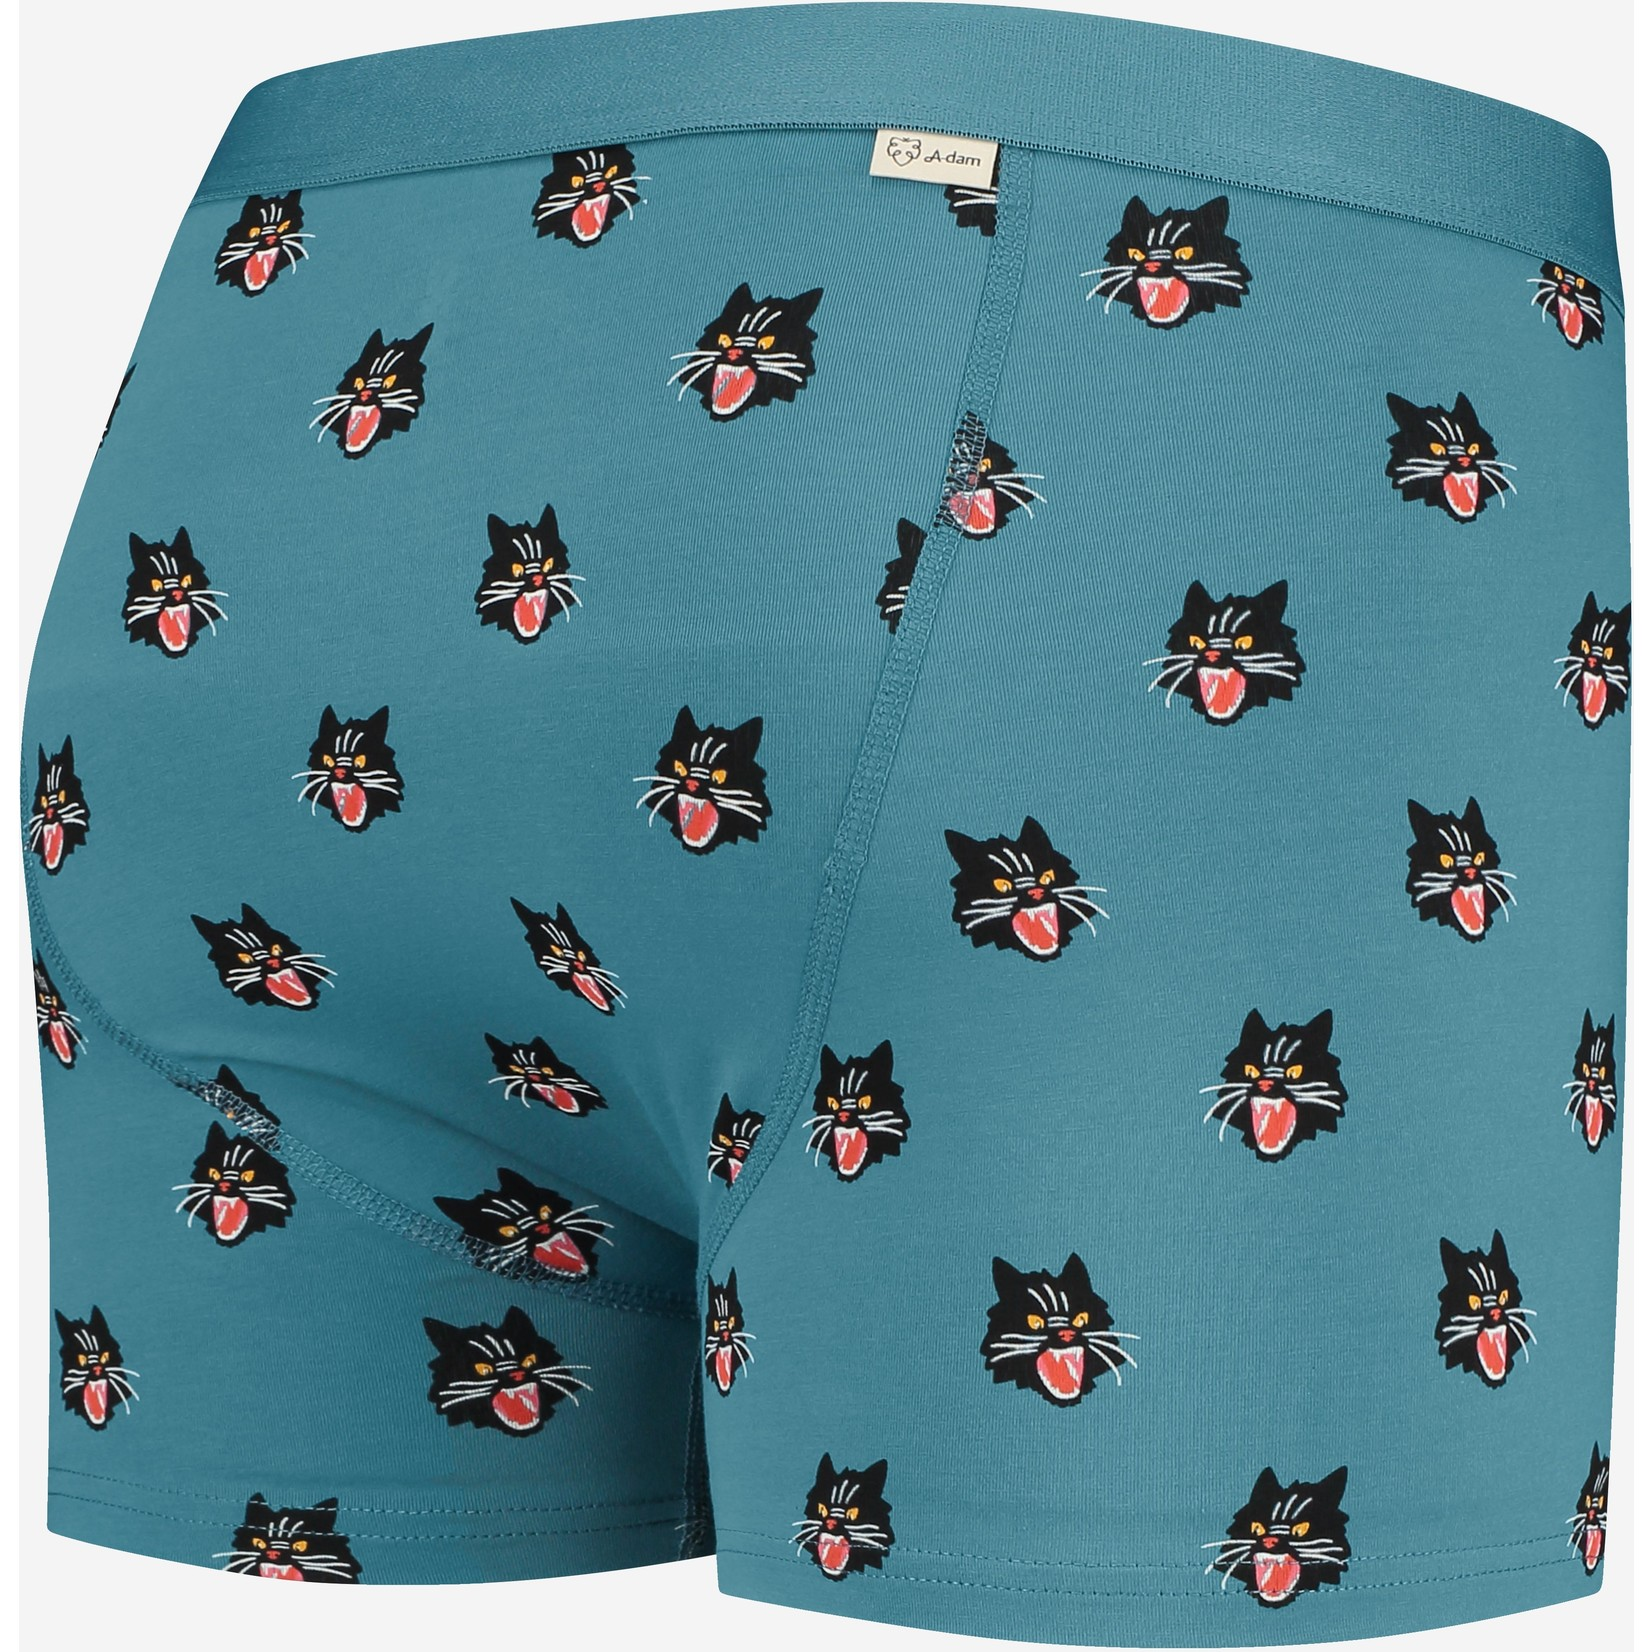 A-dam Underwear boxer Carlos